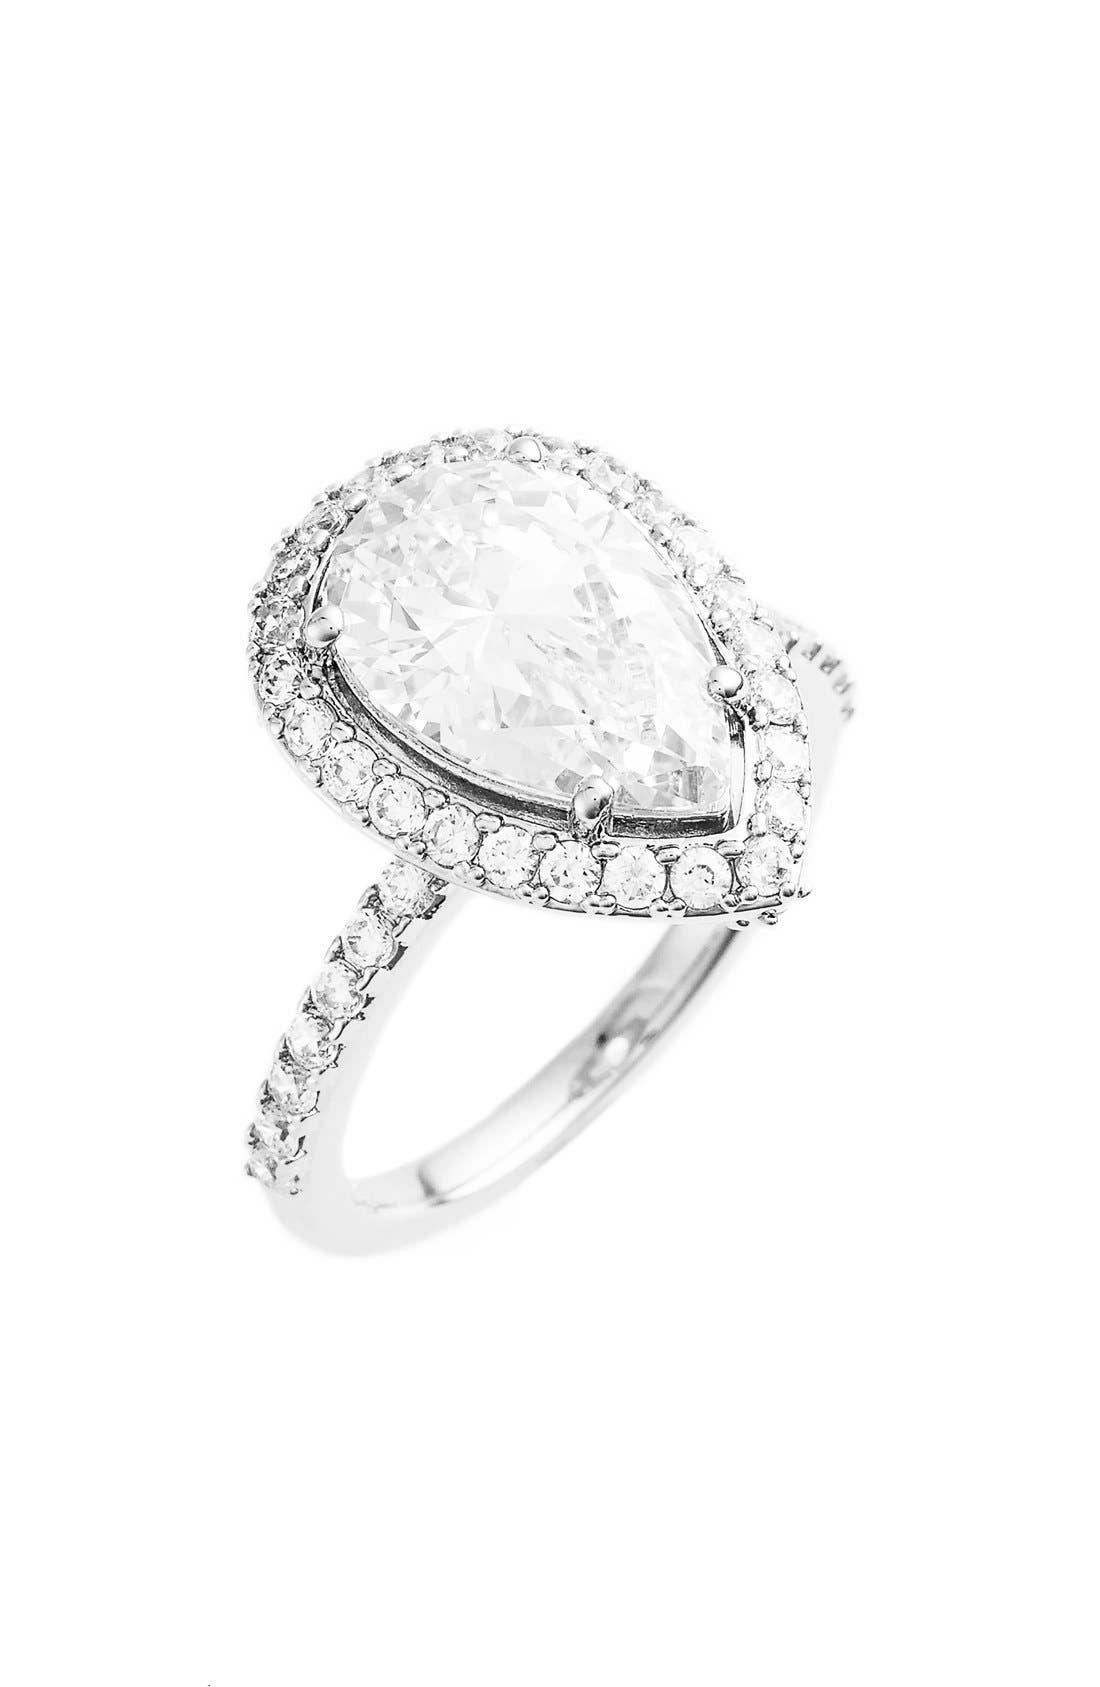 Main Image - Nadri Pear Cut Cubic Zirconia Ring